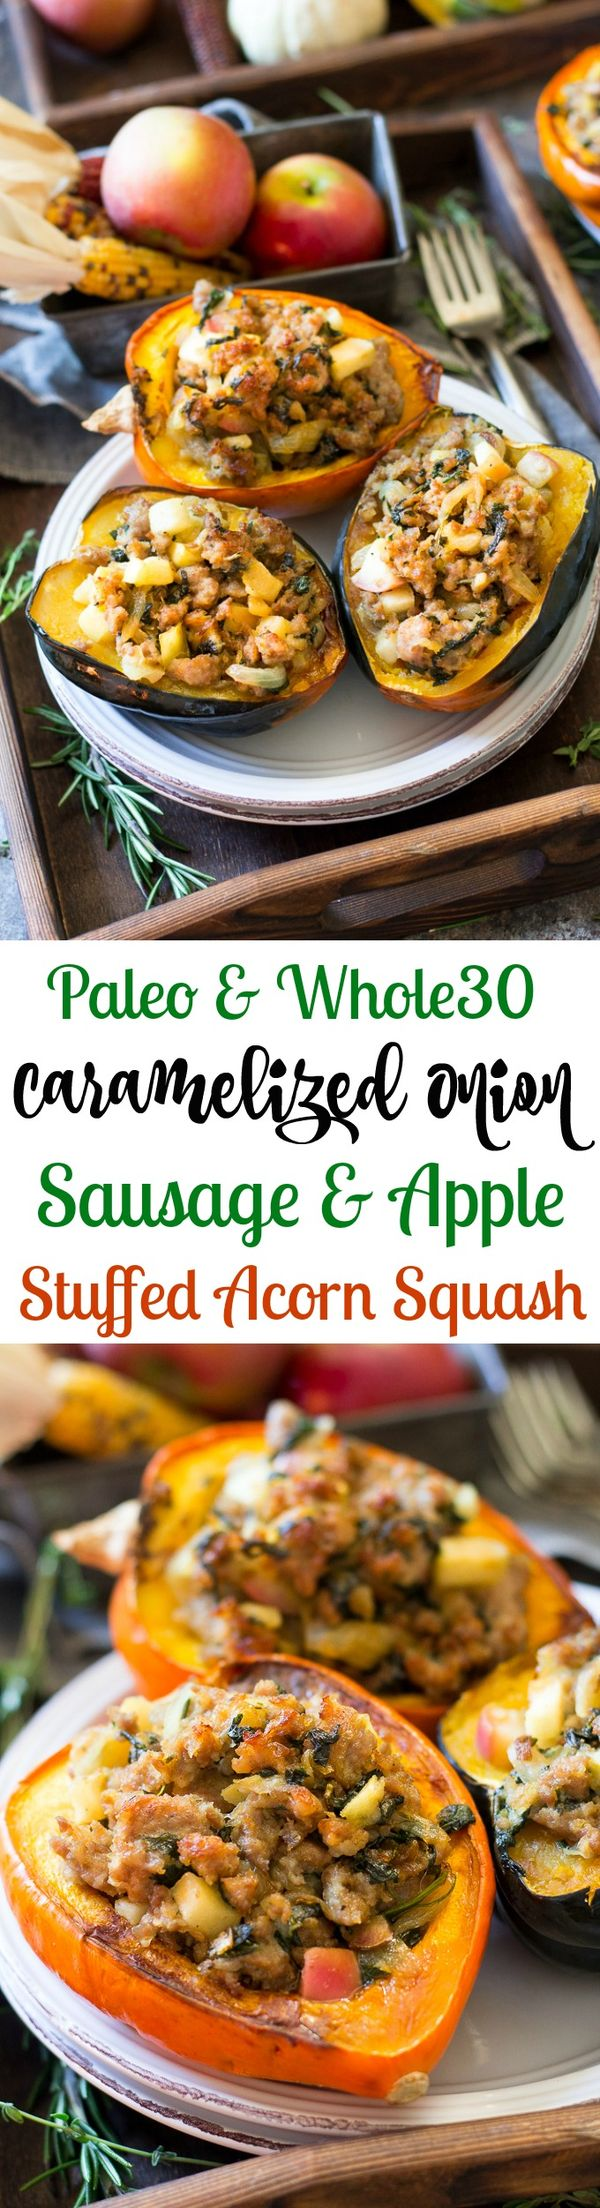 Caramelized Onion, Apple and Sausage Stuffed Acorn Squash (Paleo & Whole30